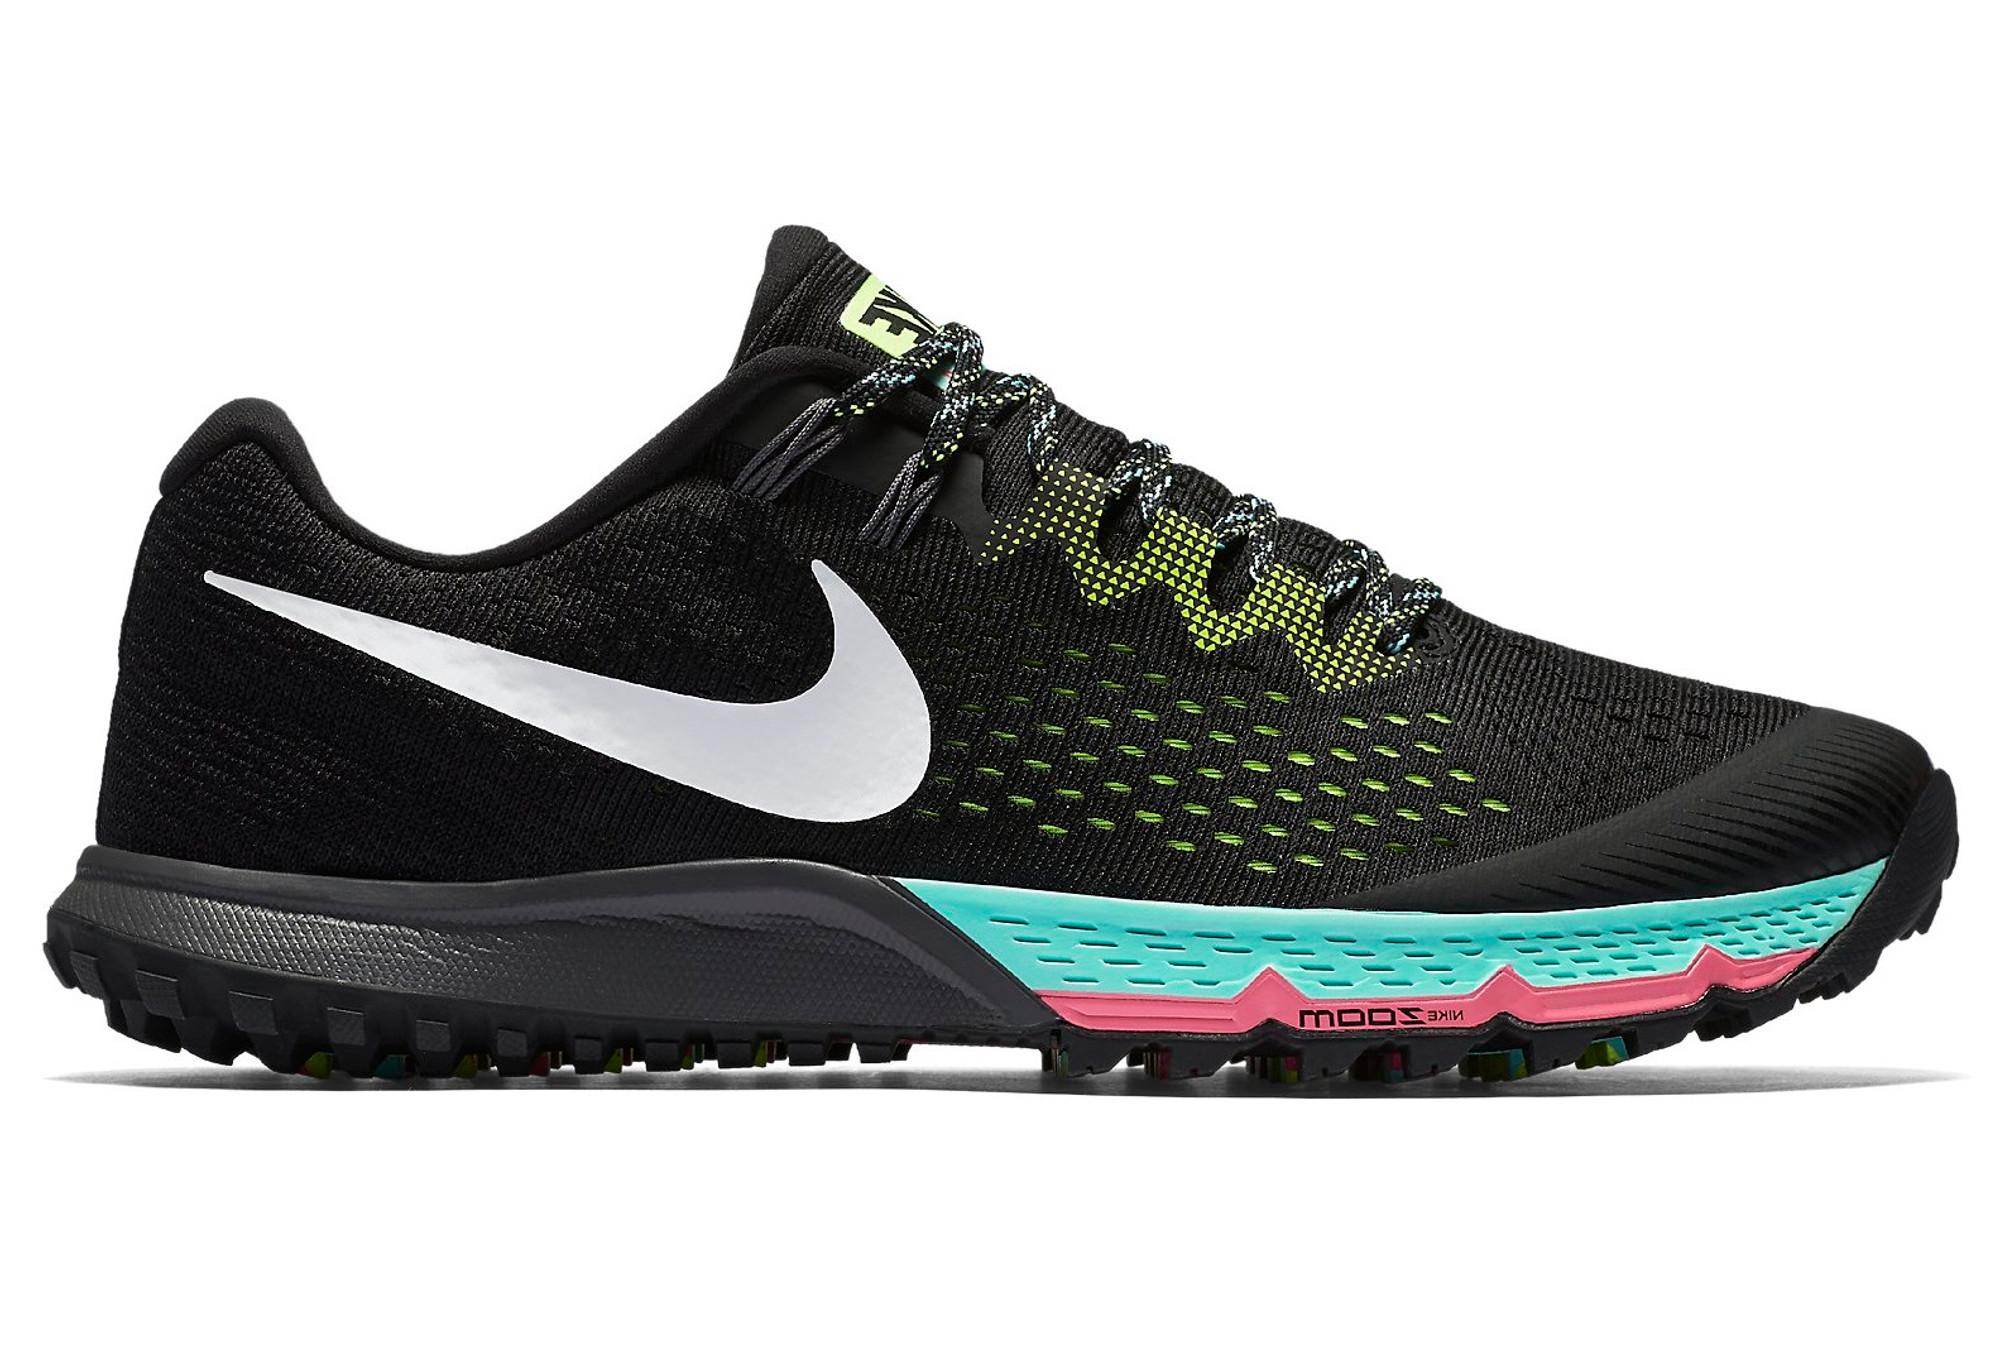 Terra Zoom Multi L435arjsqc Noir Femme Trail 4 Kiger De Nike Chaussures 67gIybYfvm